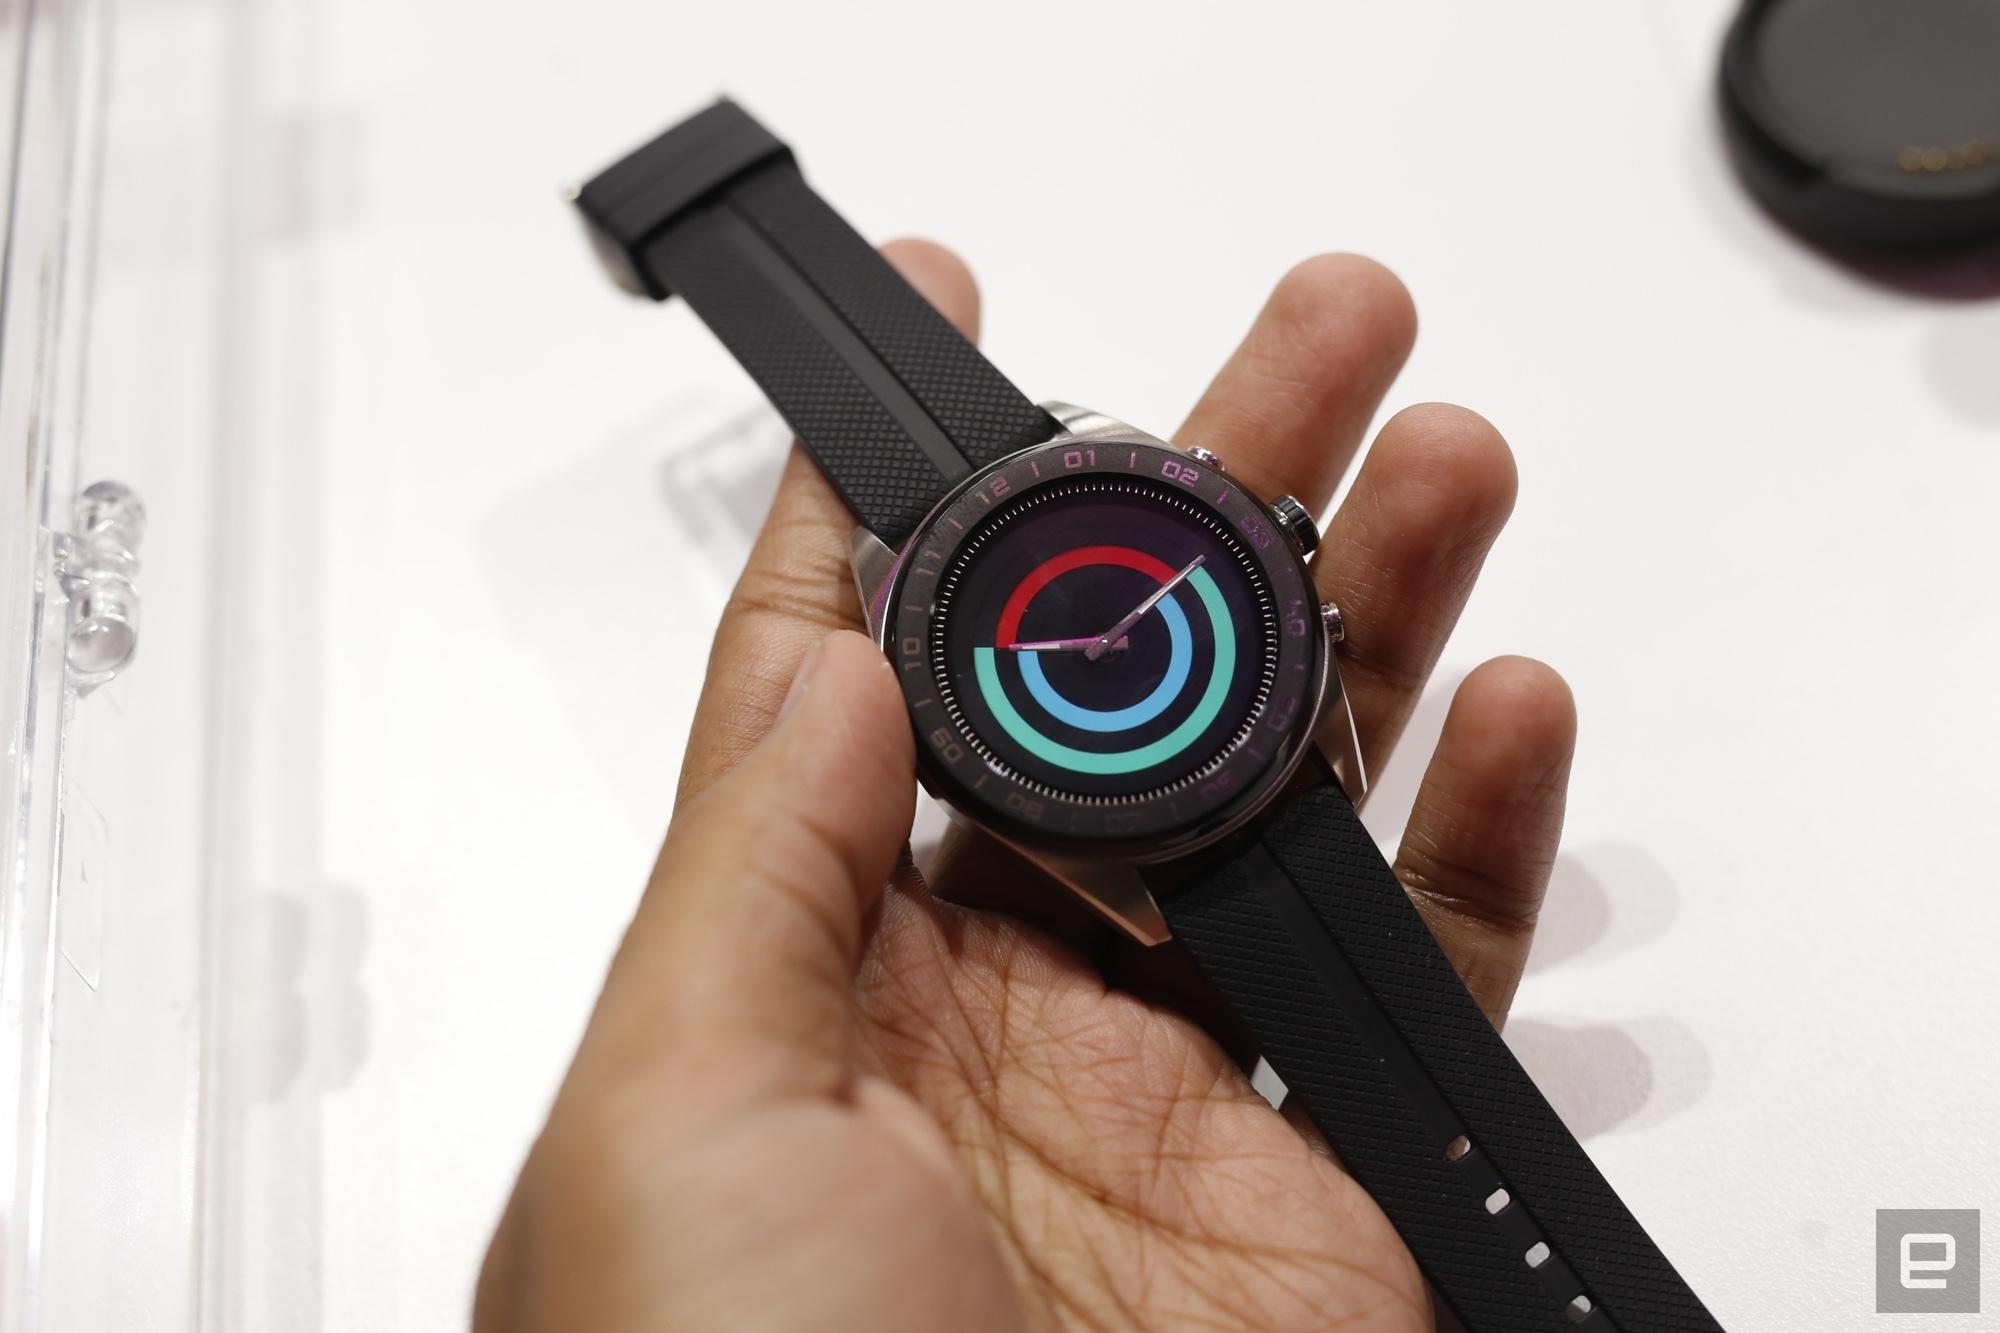 LG hybrid smart watch 2